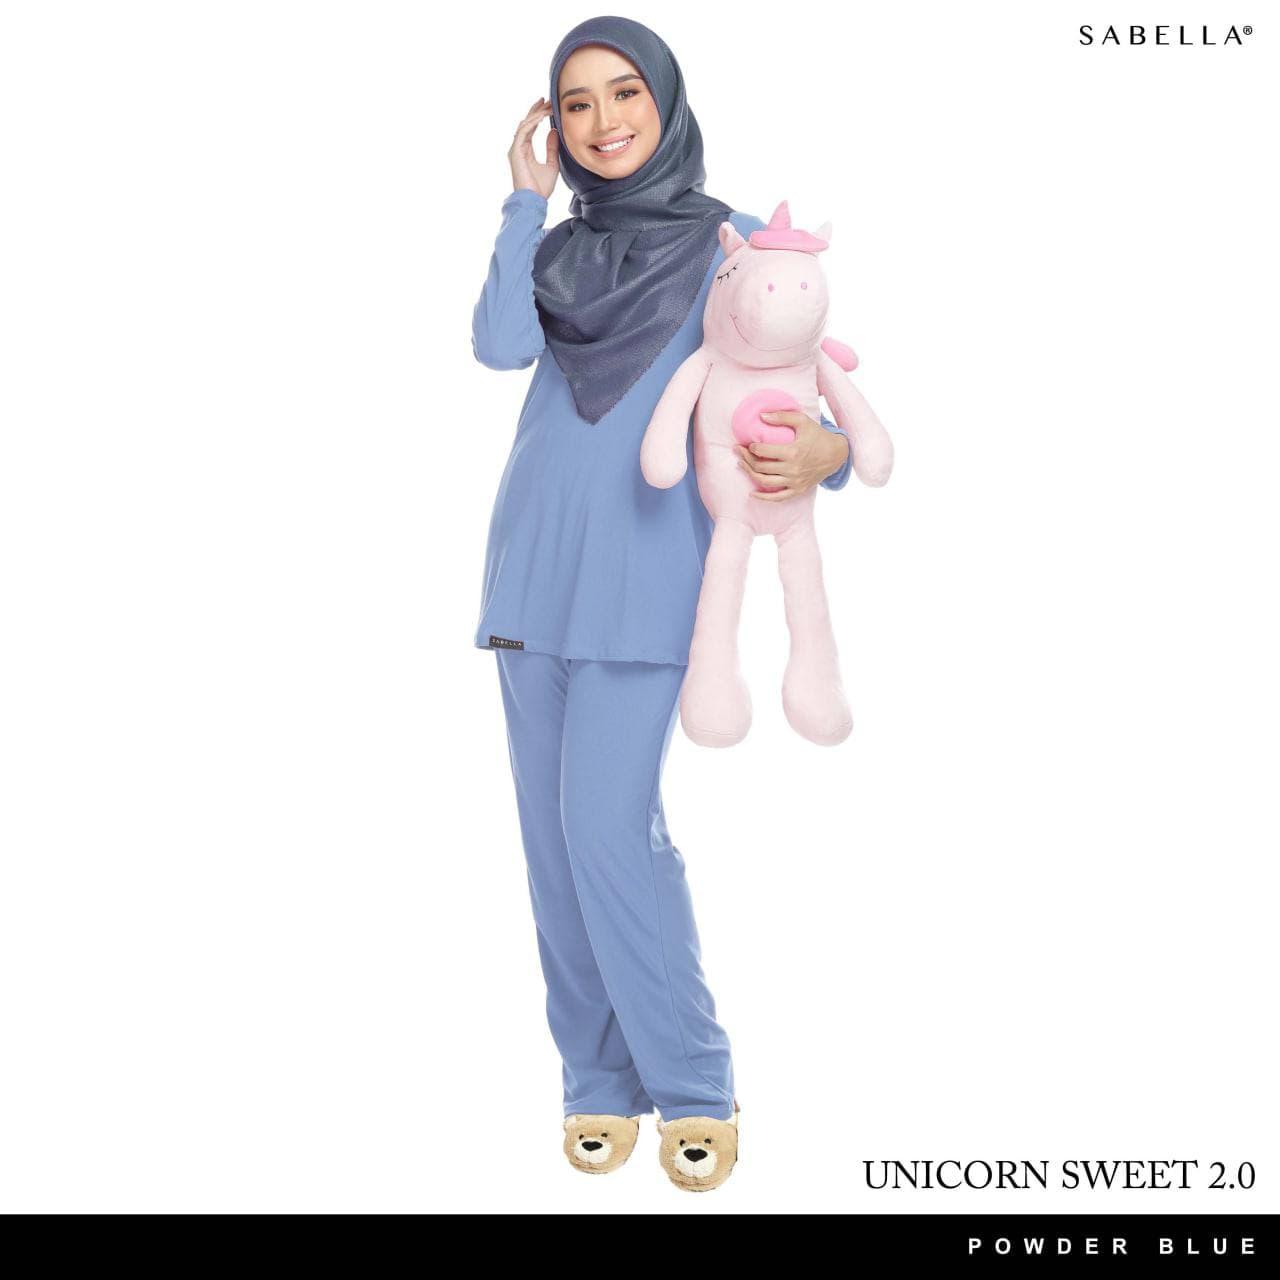 Unicorn Sweet 2.0 Powder Blue